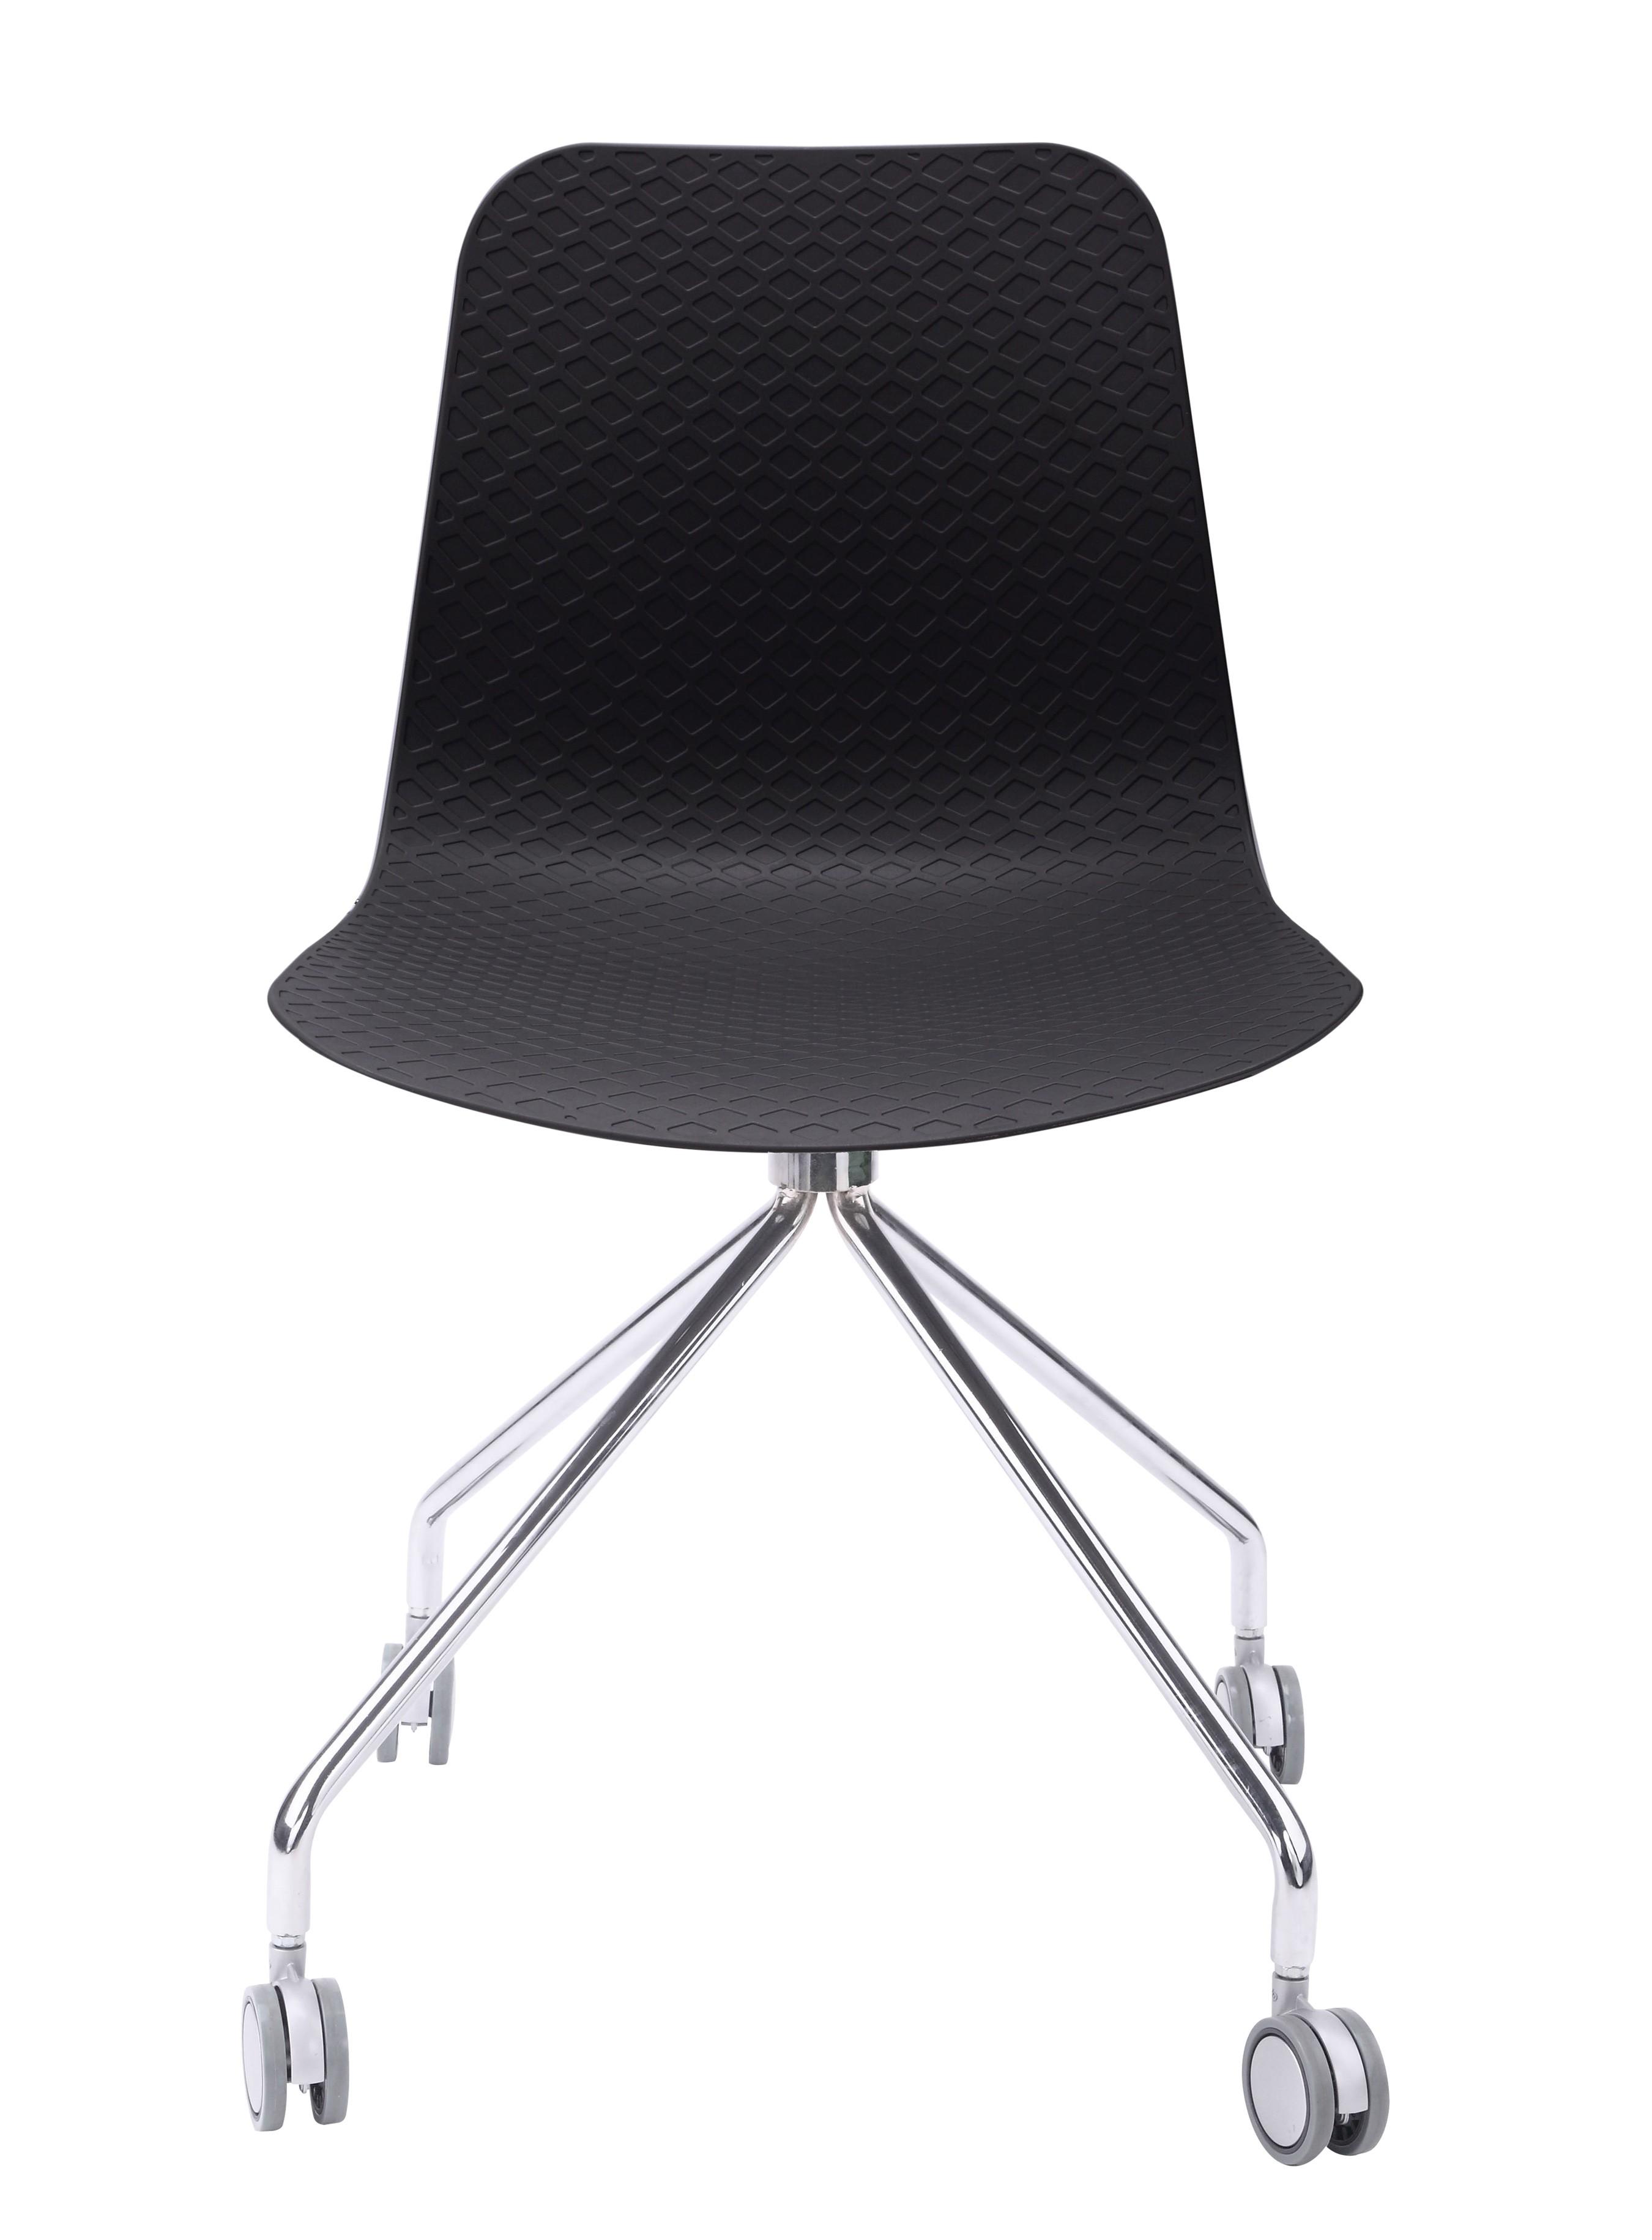 Hebe Series Black fice Chair Molded Plastic Designer Task Chair